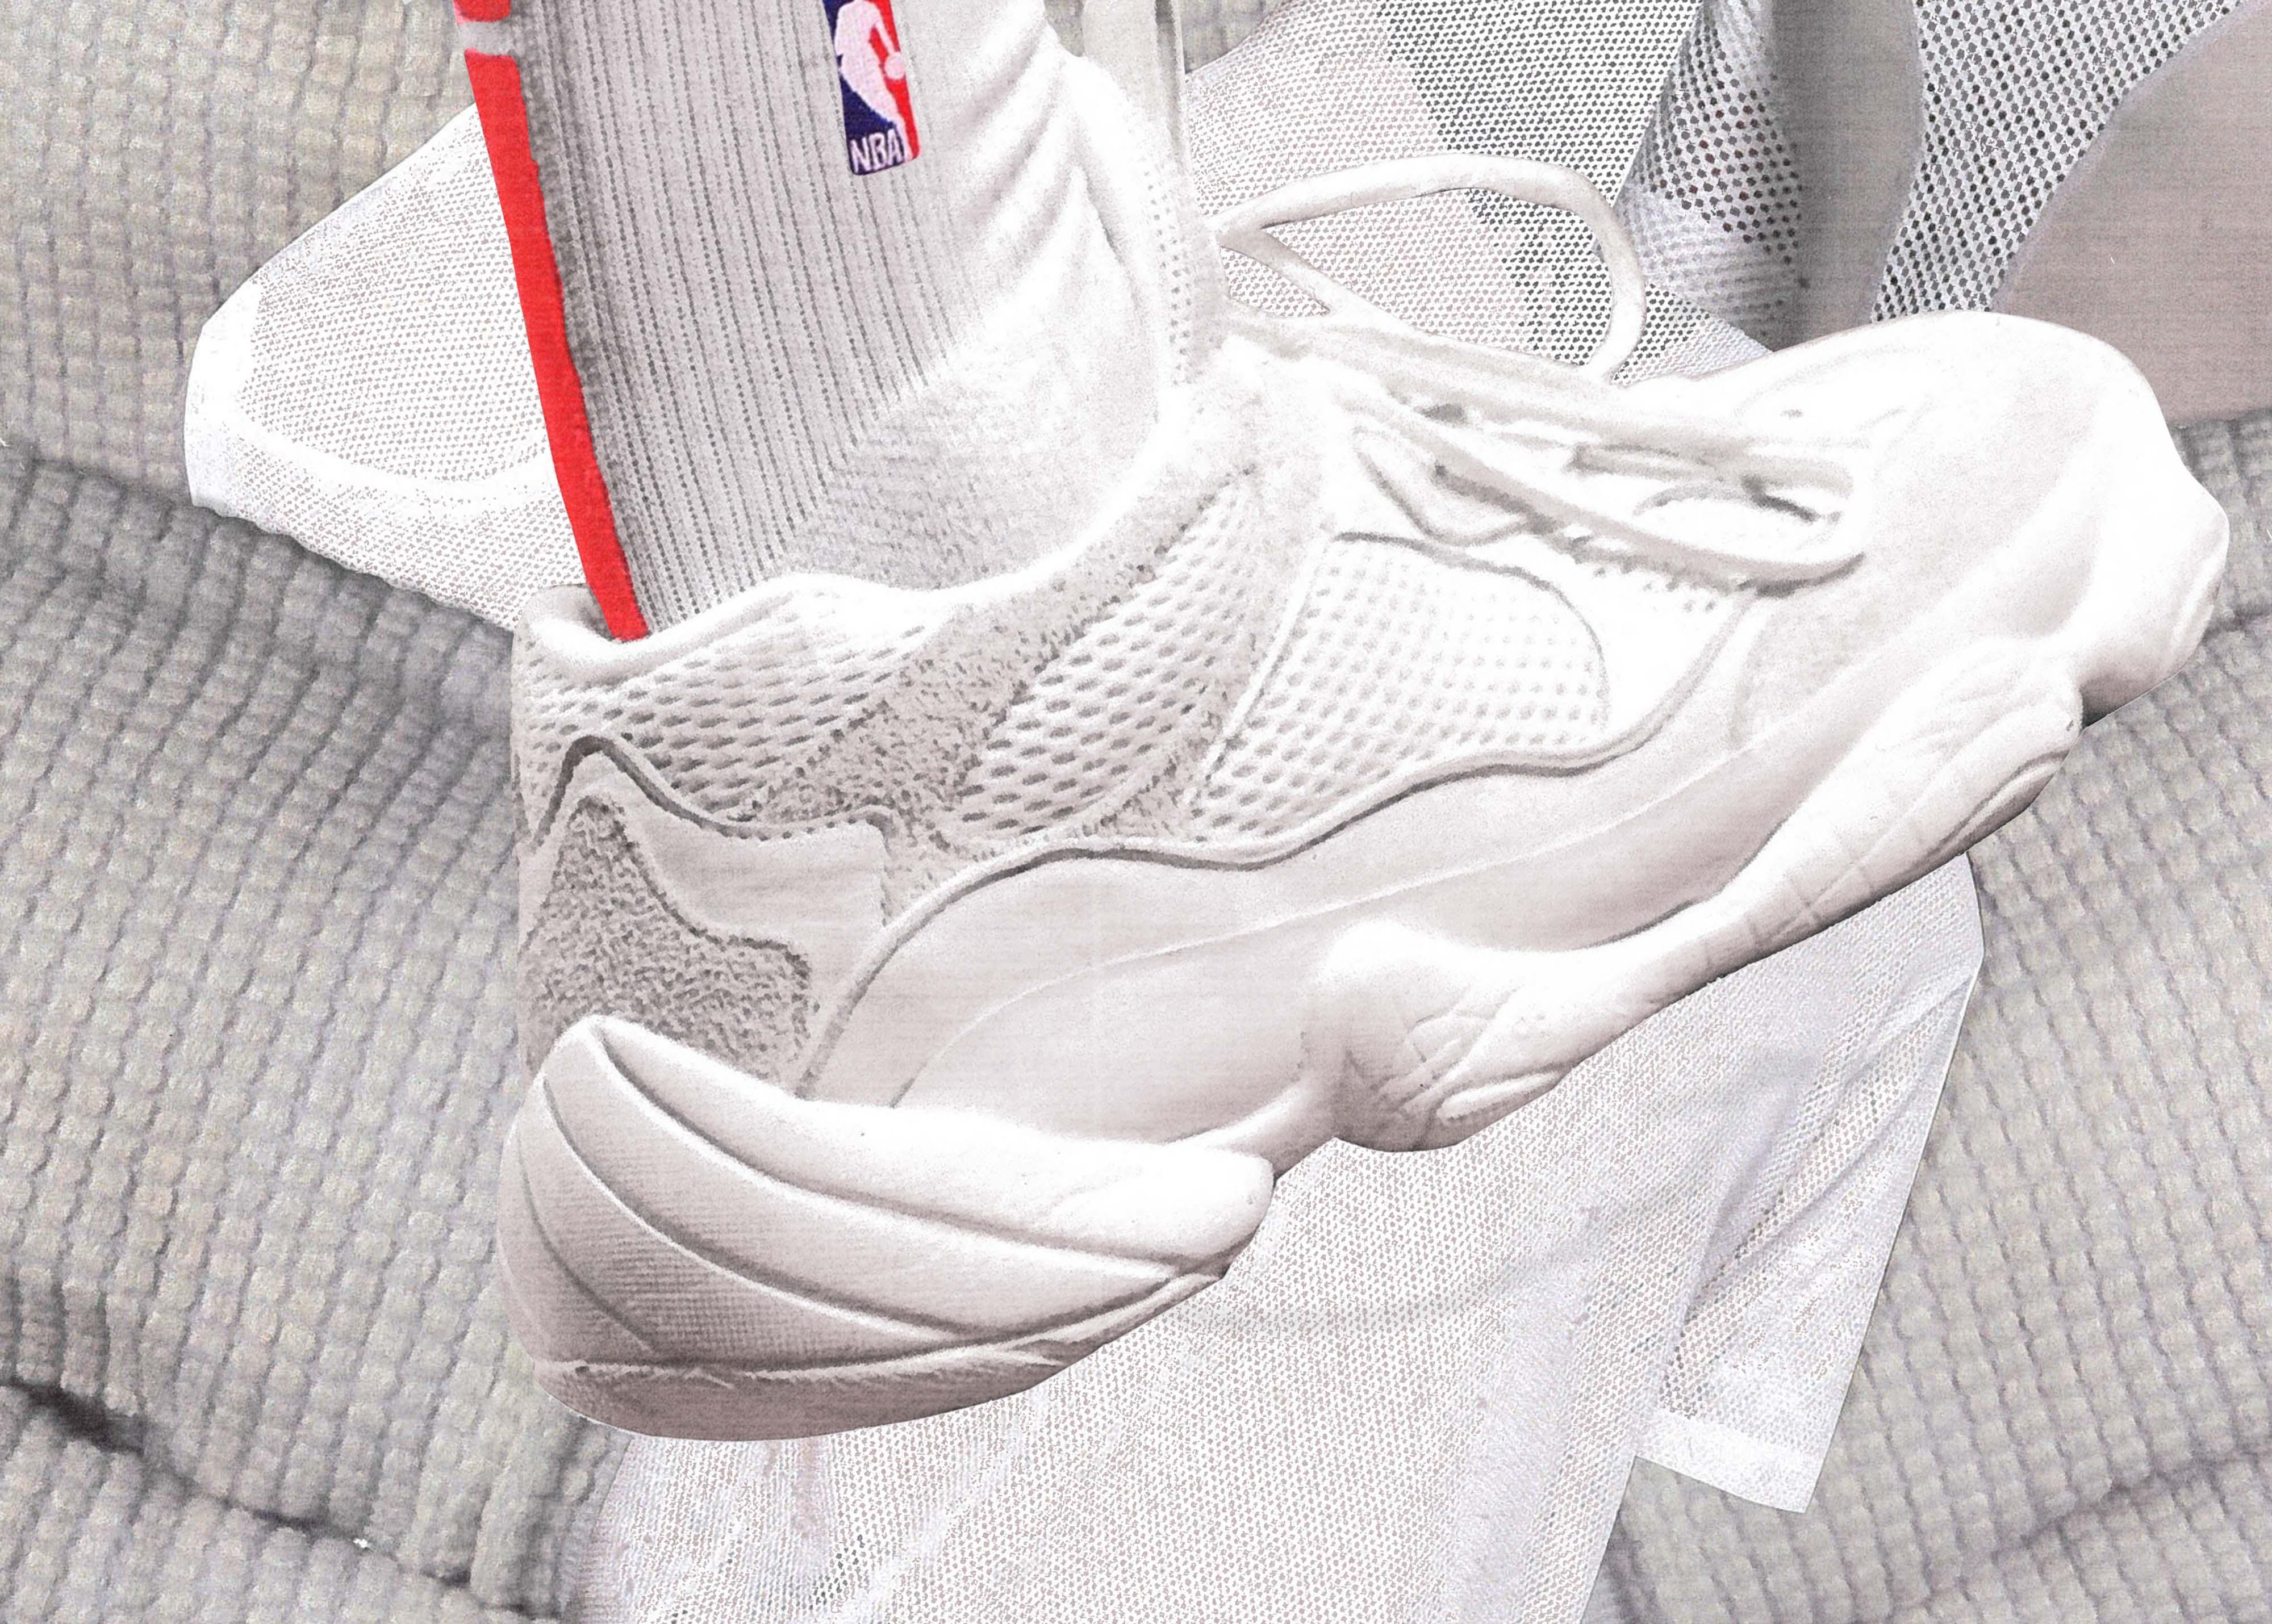 Adidas Climacool 02.17 Primeknit